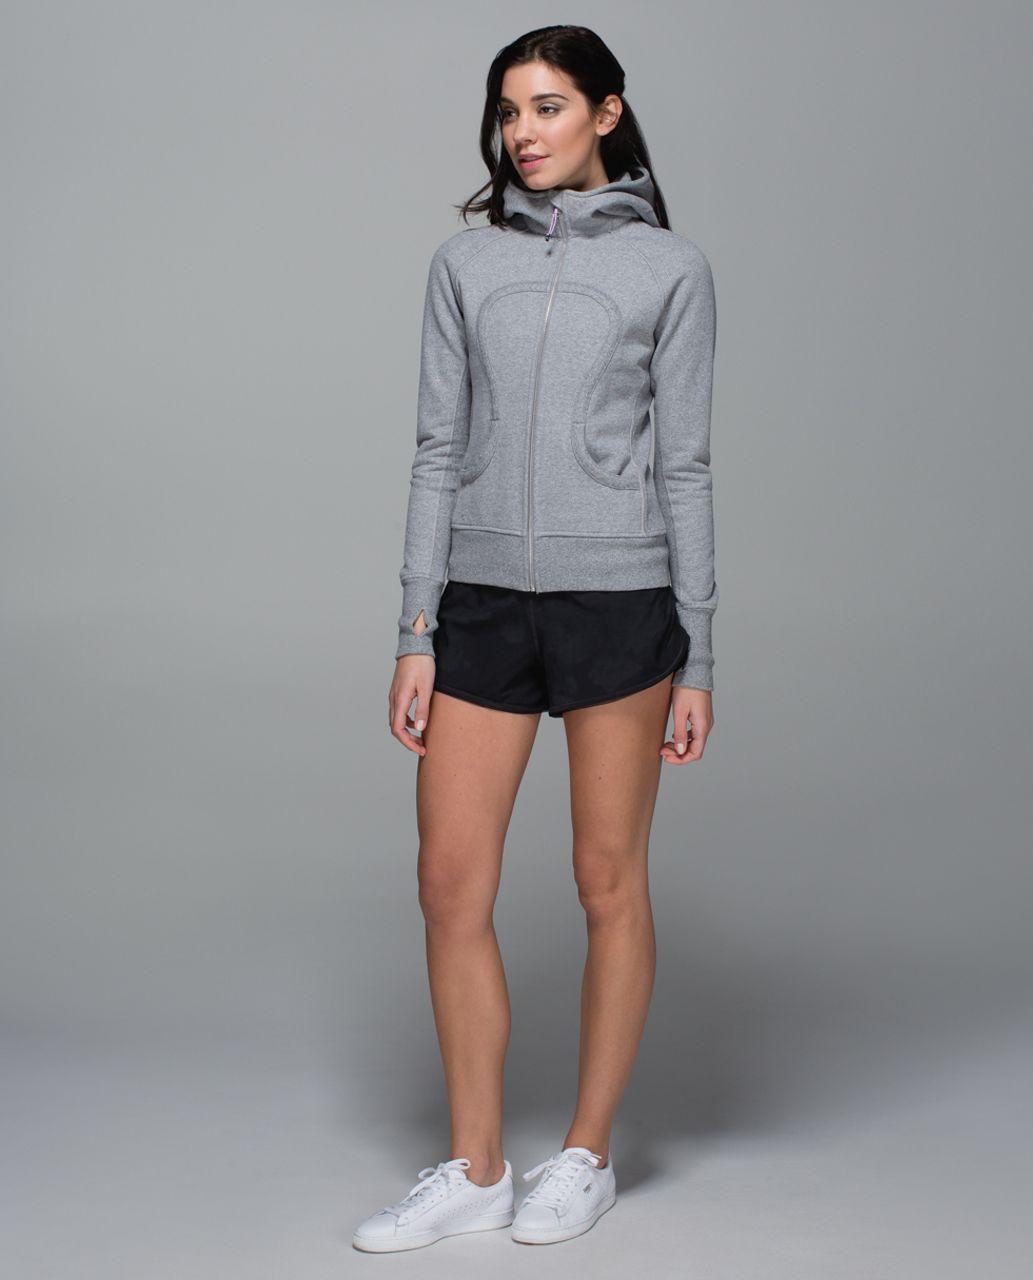 Lululemon Scuba Hoodie II - Heathered Speckled Medium Grey / Ambient Grey